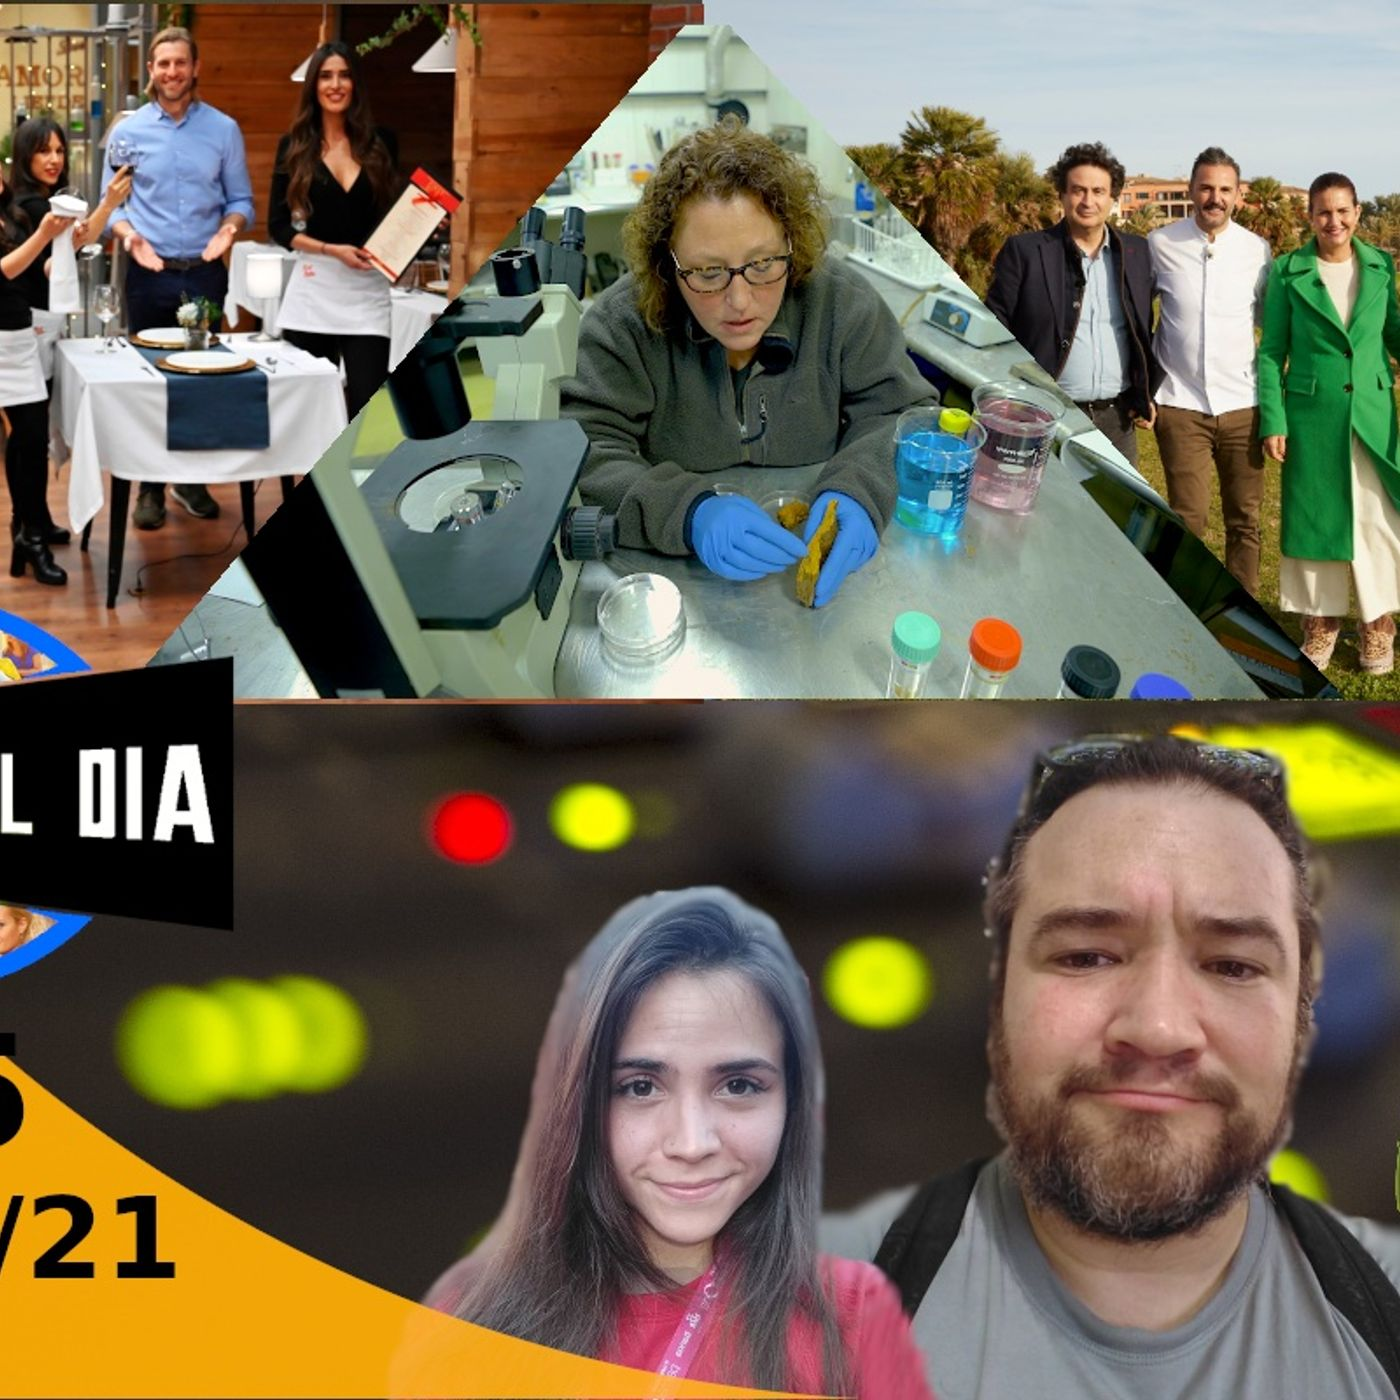 The Dancer | Got Talent | Ponte al día 425 (09/04/21)